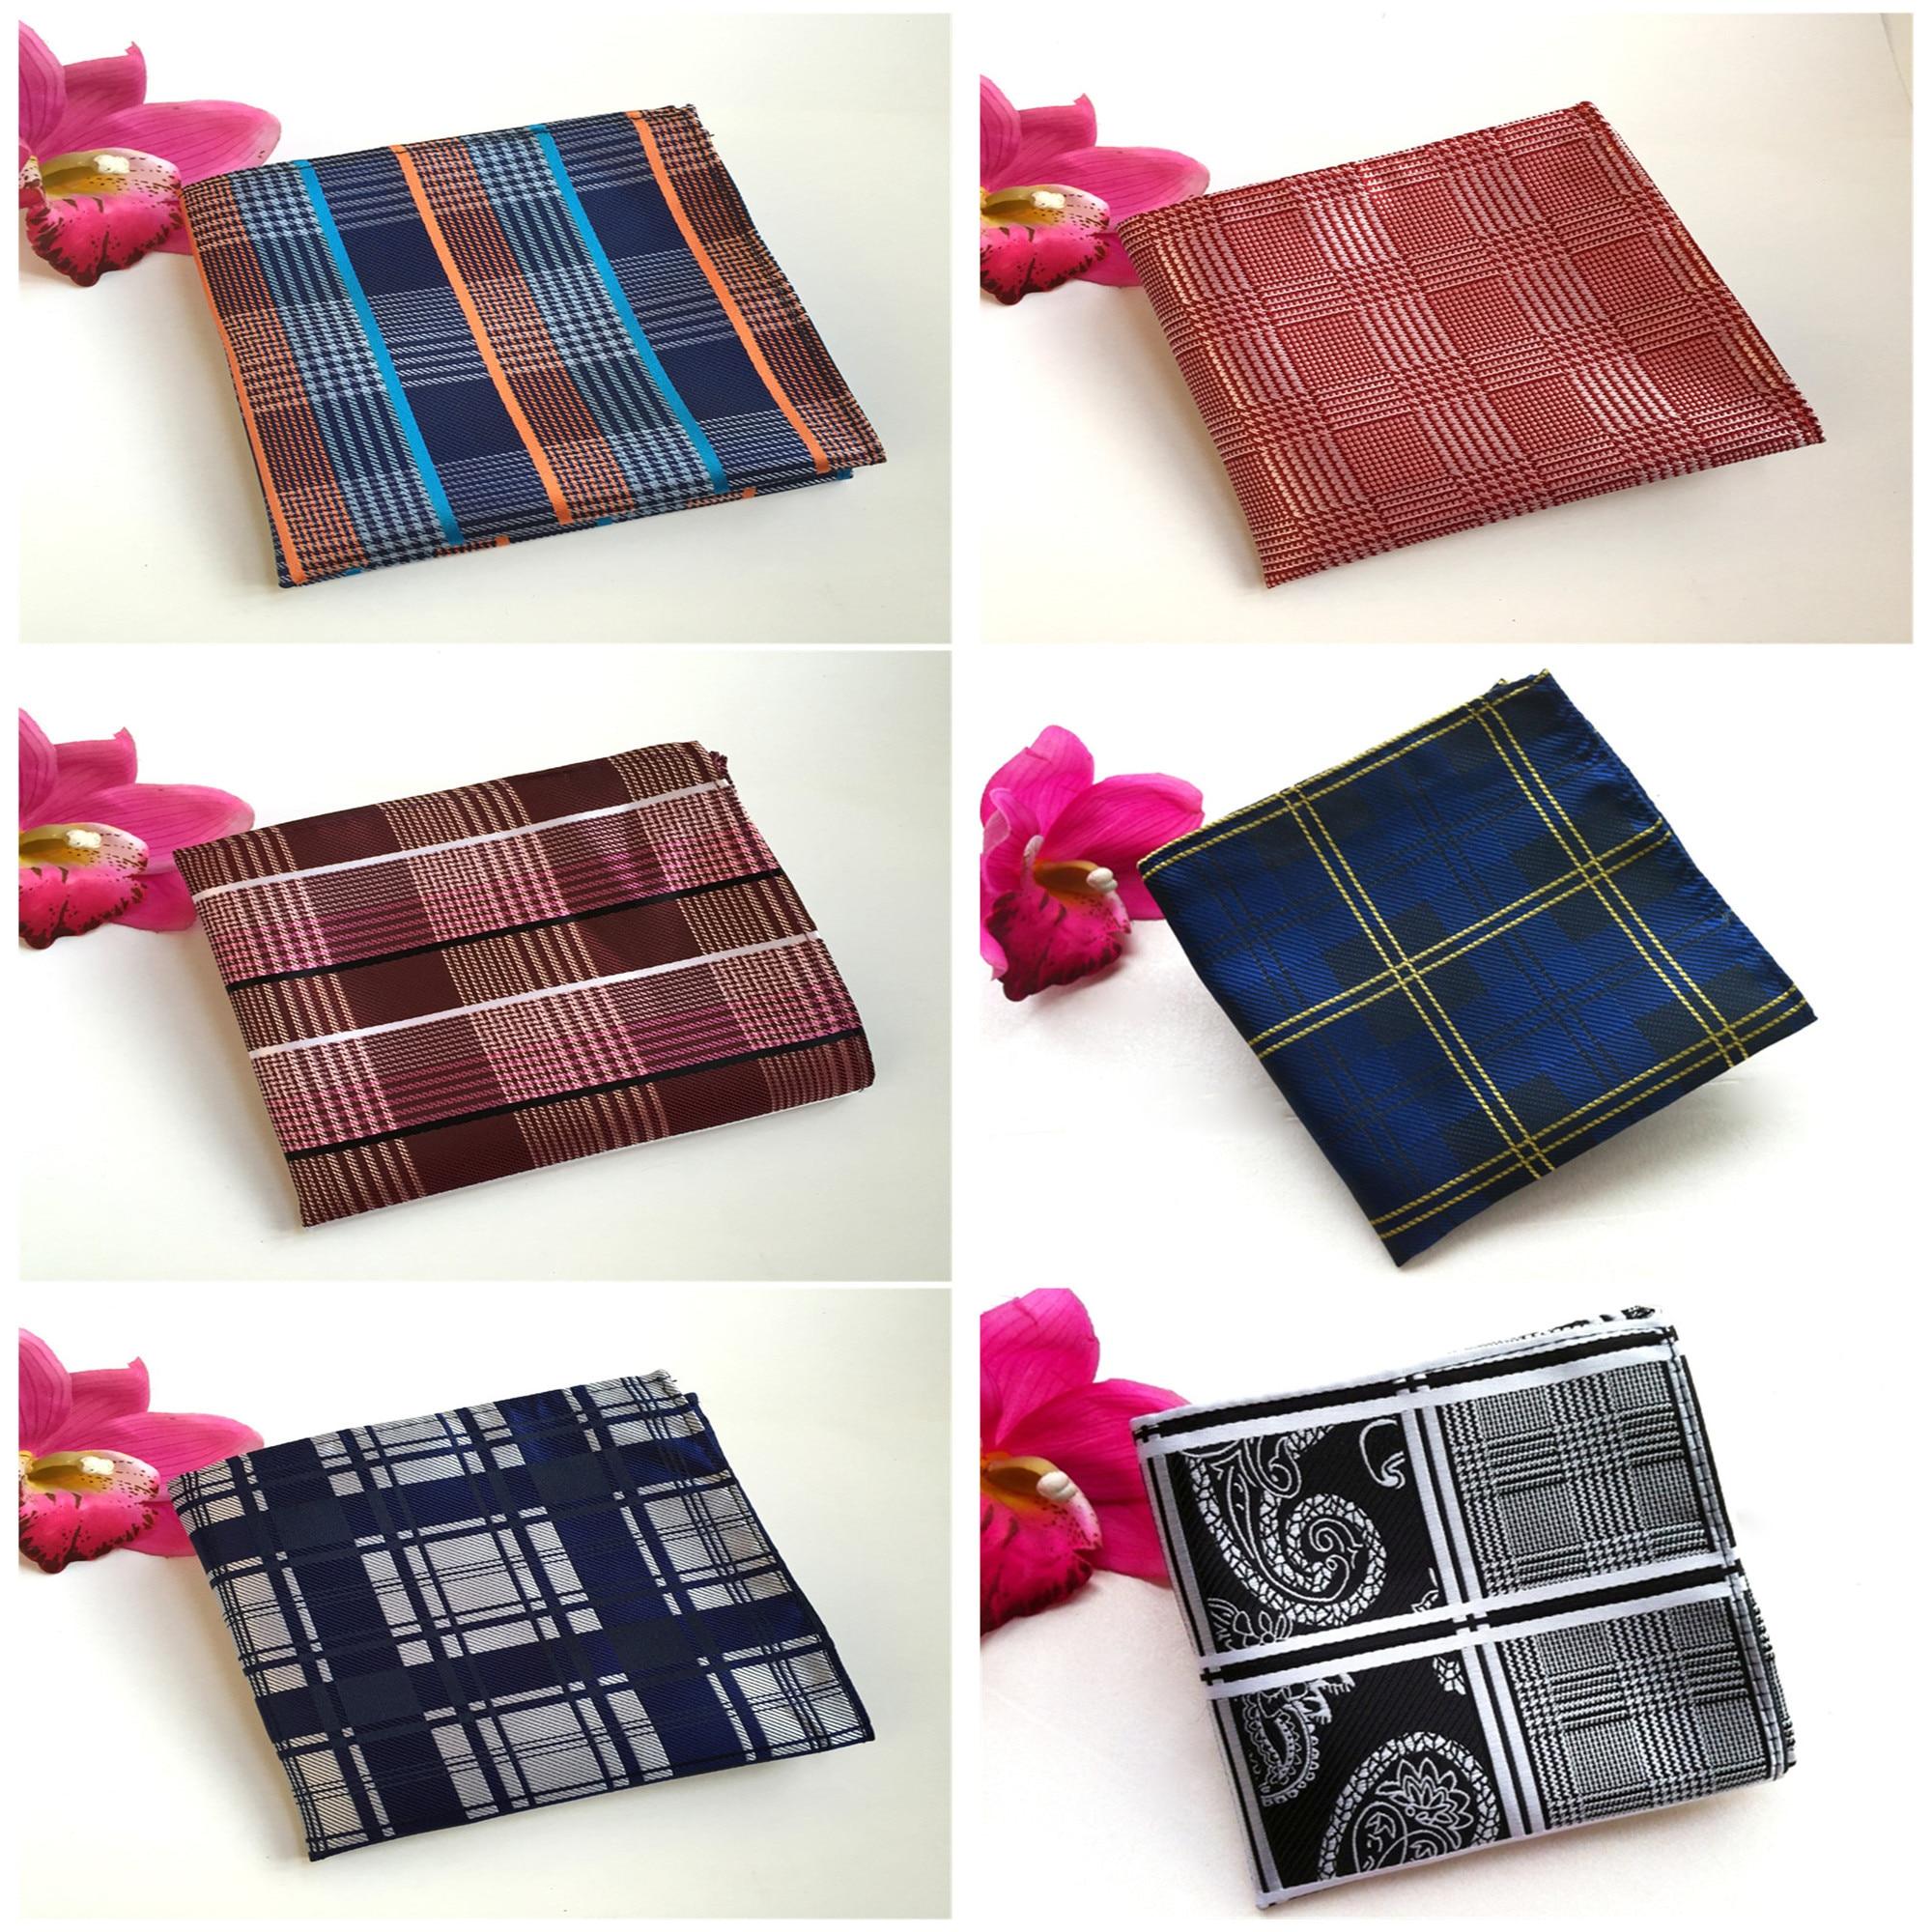 2020 High Quality Explosion Polyester Pattern Suit Handkerchief Pocket Towel Exclusive Design Fashion Men's Pocket Towel